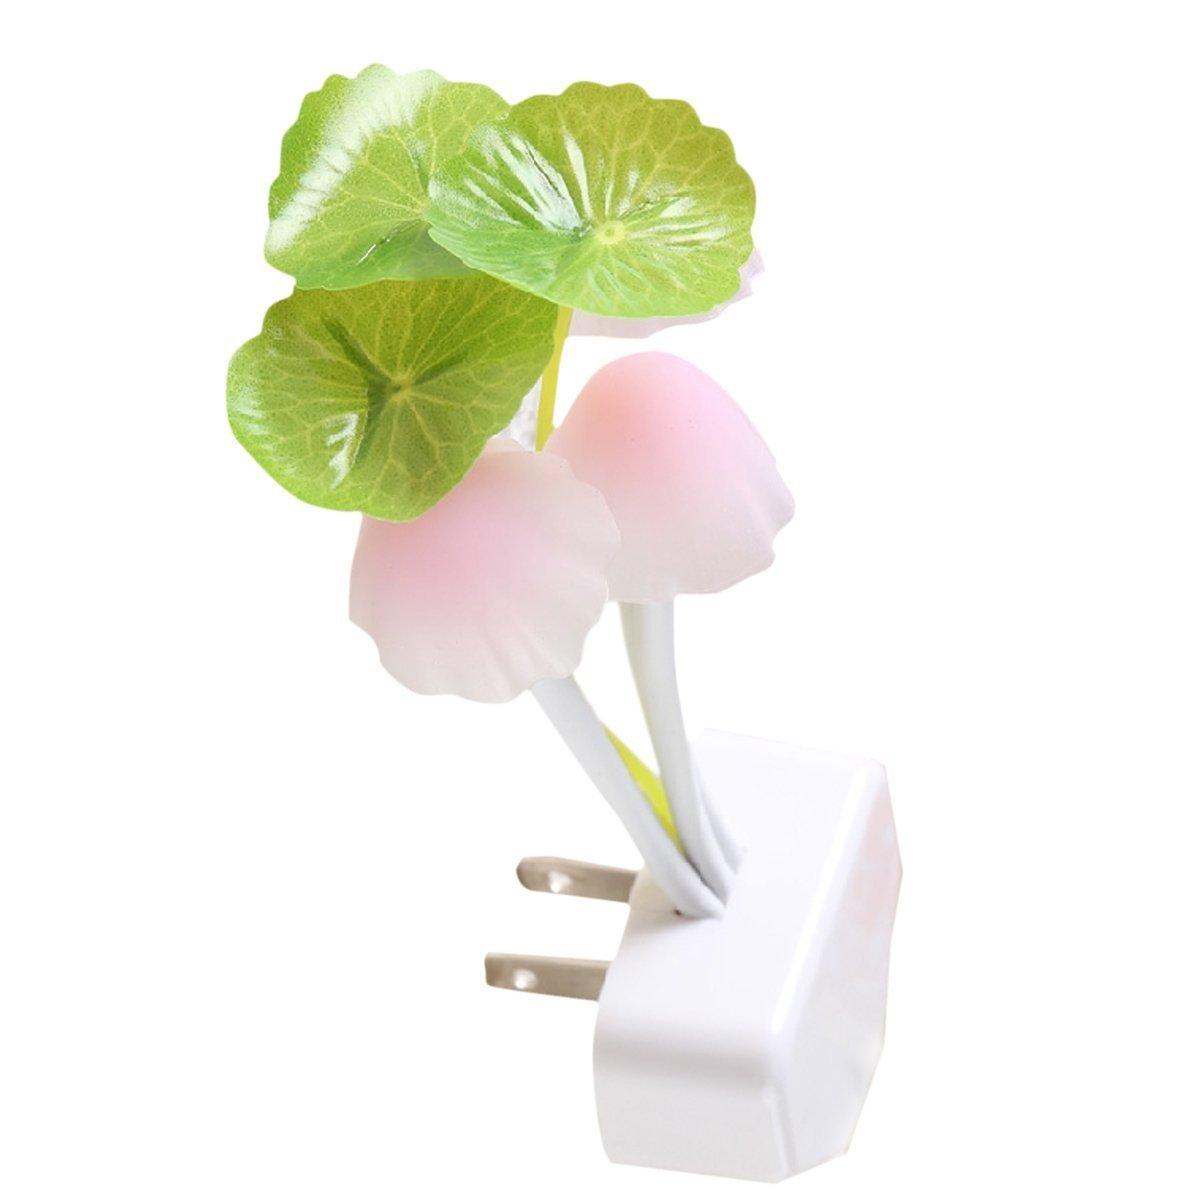 Wall night lamp online india - Nicerocker New Energy Saving Creative Design Led Night Light For Bed Lamp Home Decor